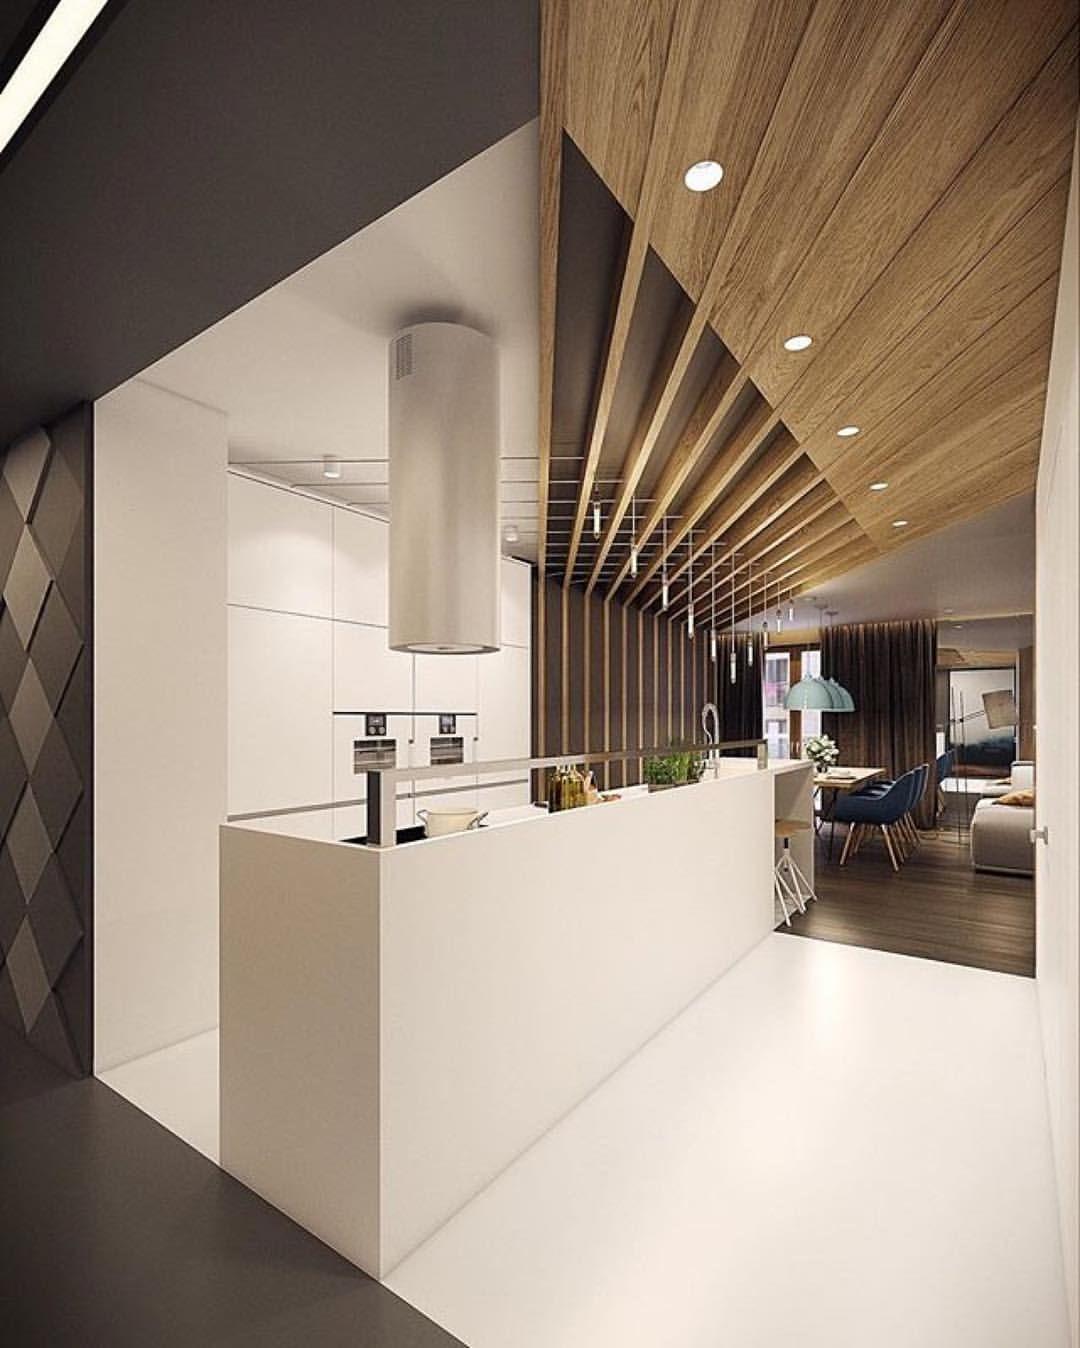 Repost @landekadesign ・・・ Great interior design by plasterlina ...